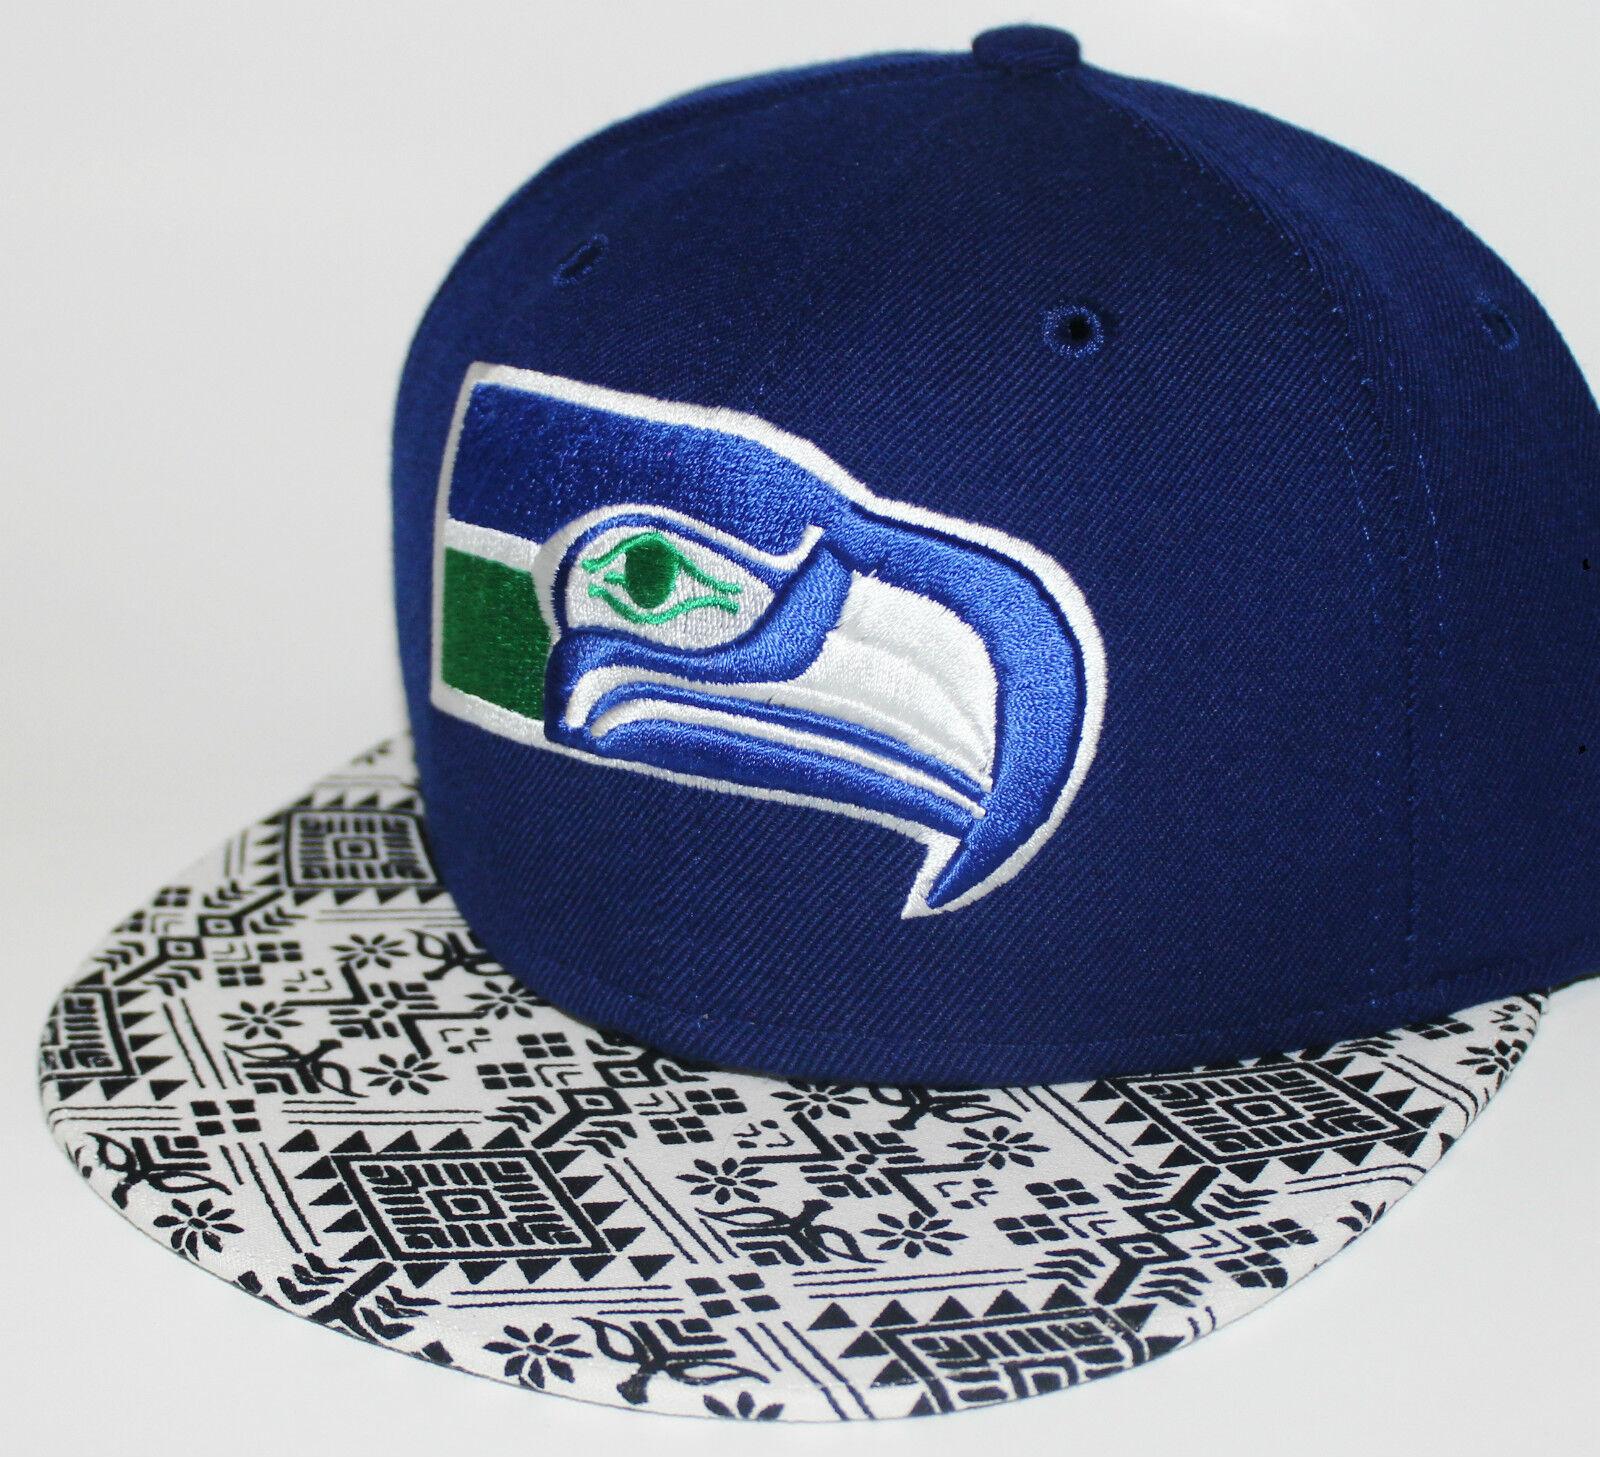 PICK1 Seattle Seahawks Native / Galaxy / Weed Bri… - image 5